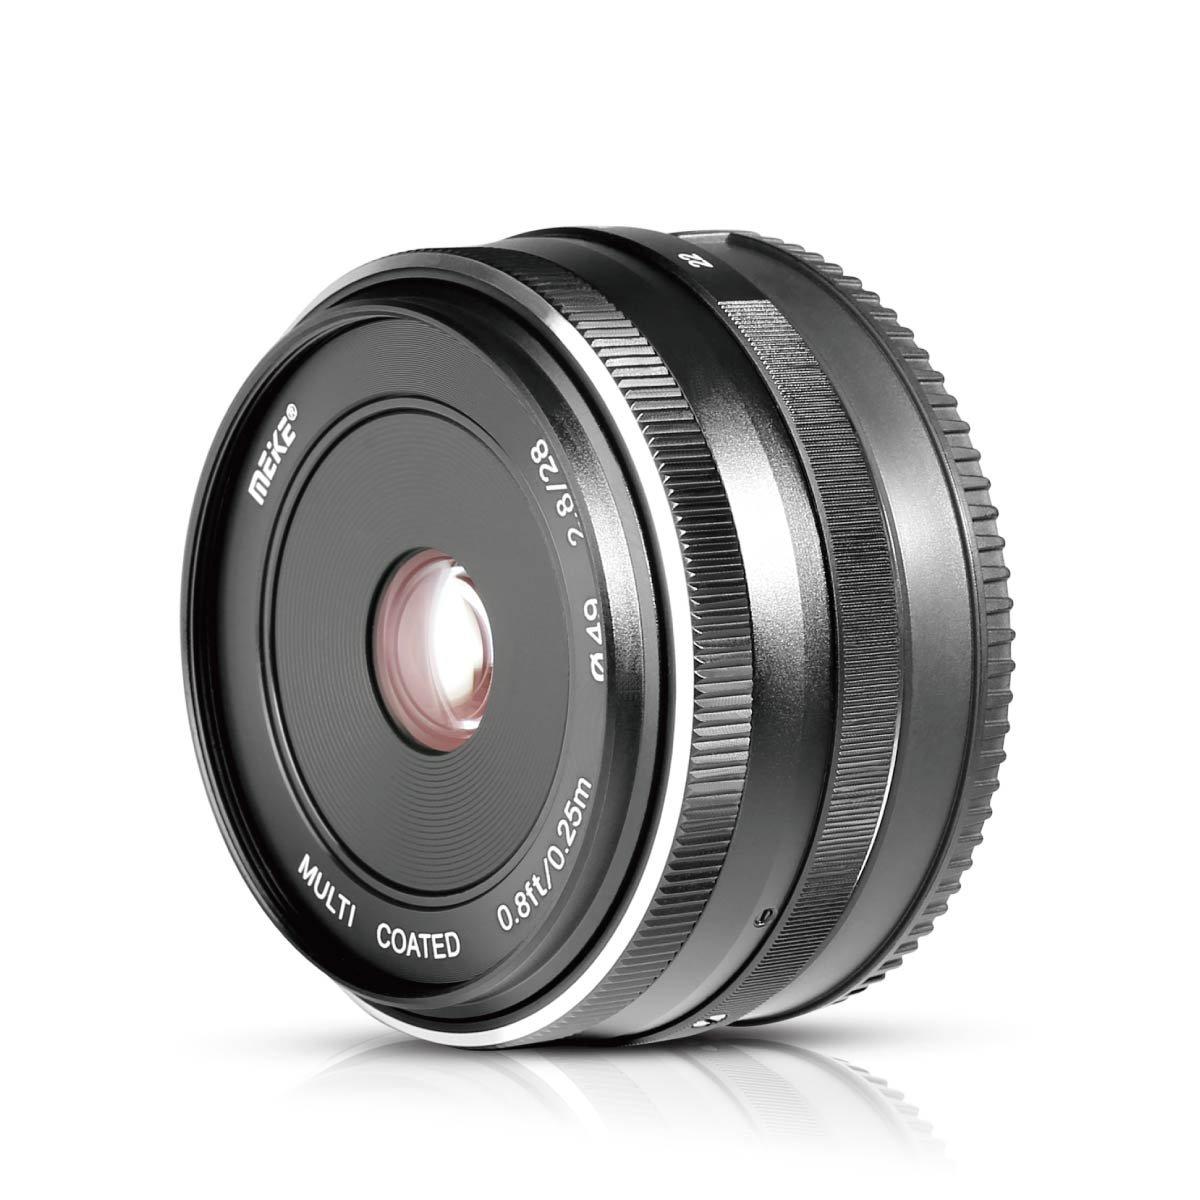 NEX-F3 a3000 a6000 a3500 a6300 Haoge Lens Mount Adapter for Nikon AI//AIS//D Mount Lens to Sony E mount NEX Camera as NEX-3 NEX-VG10 NEX-7N VG20 a6500 NEX-7 NEX-5N NEX-C3 NEX-5 a5000